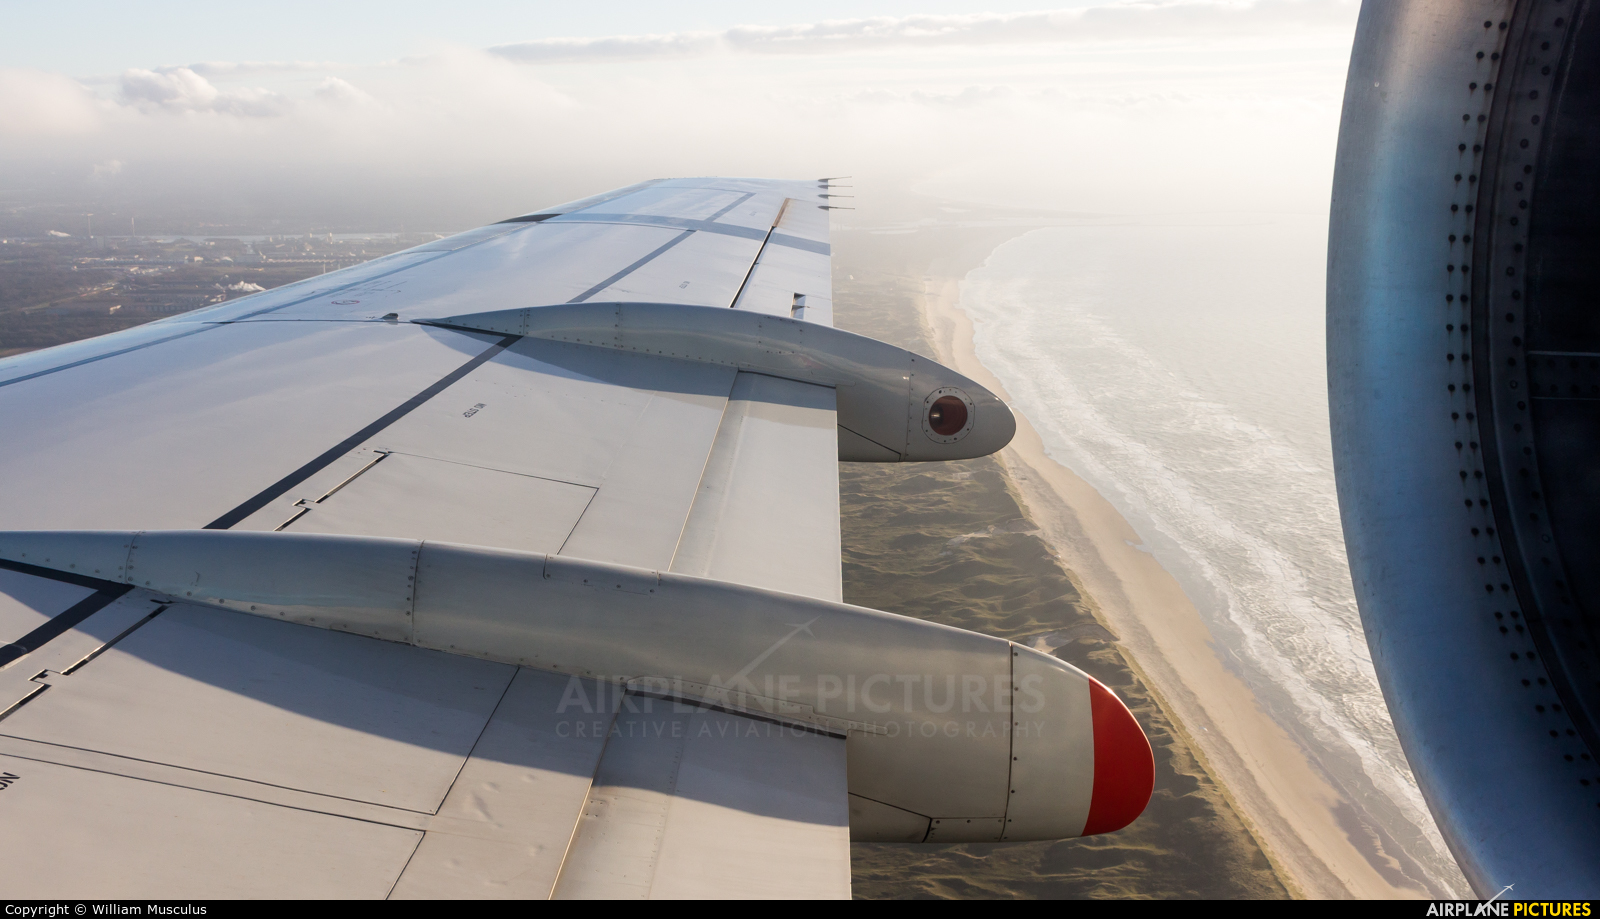 KLM Cityhopper PH-KZS aircraft at Off Airport - Netherlands